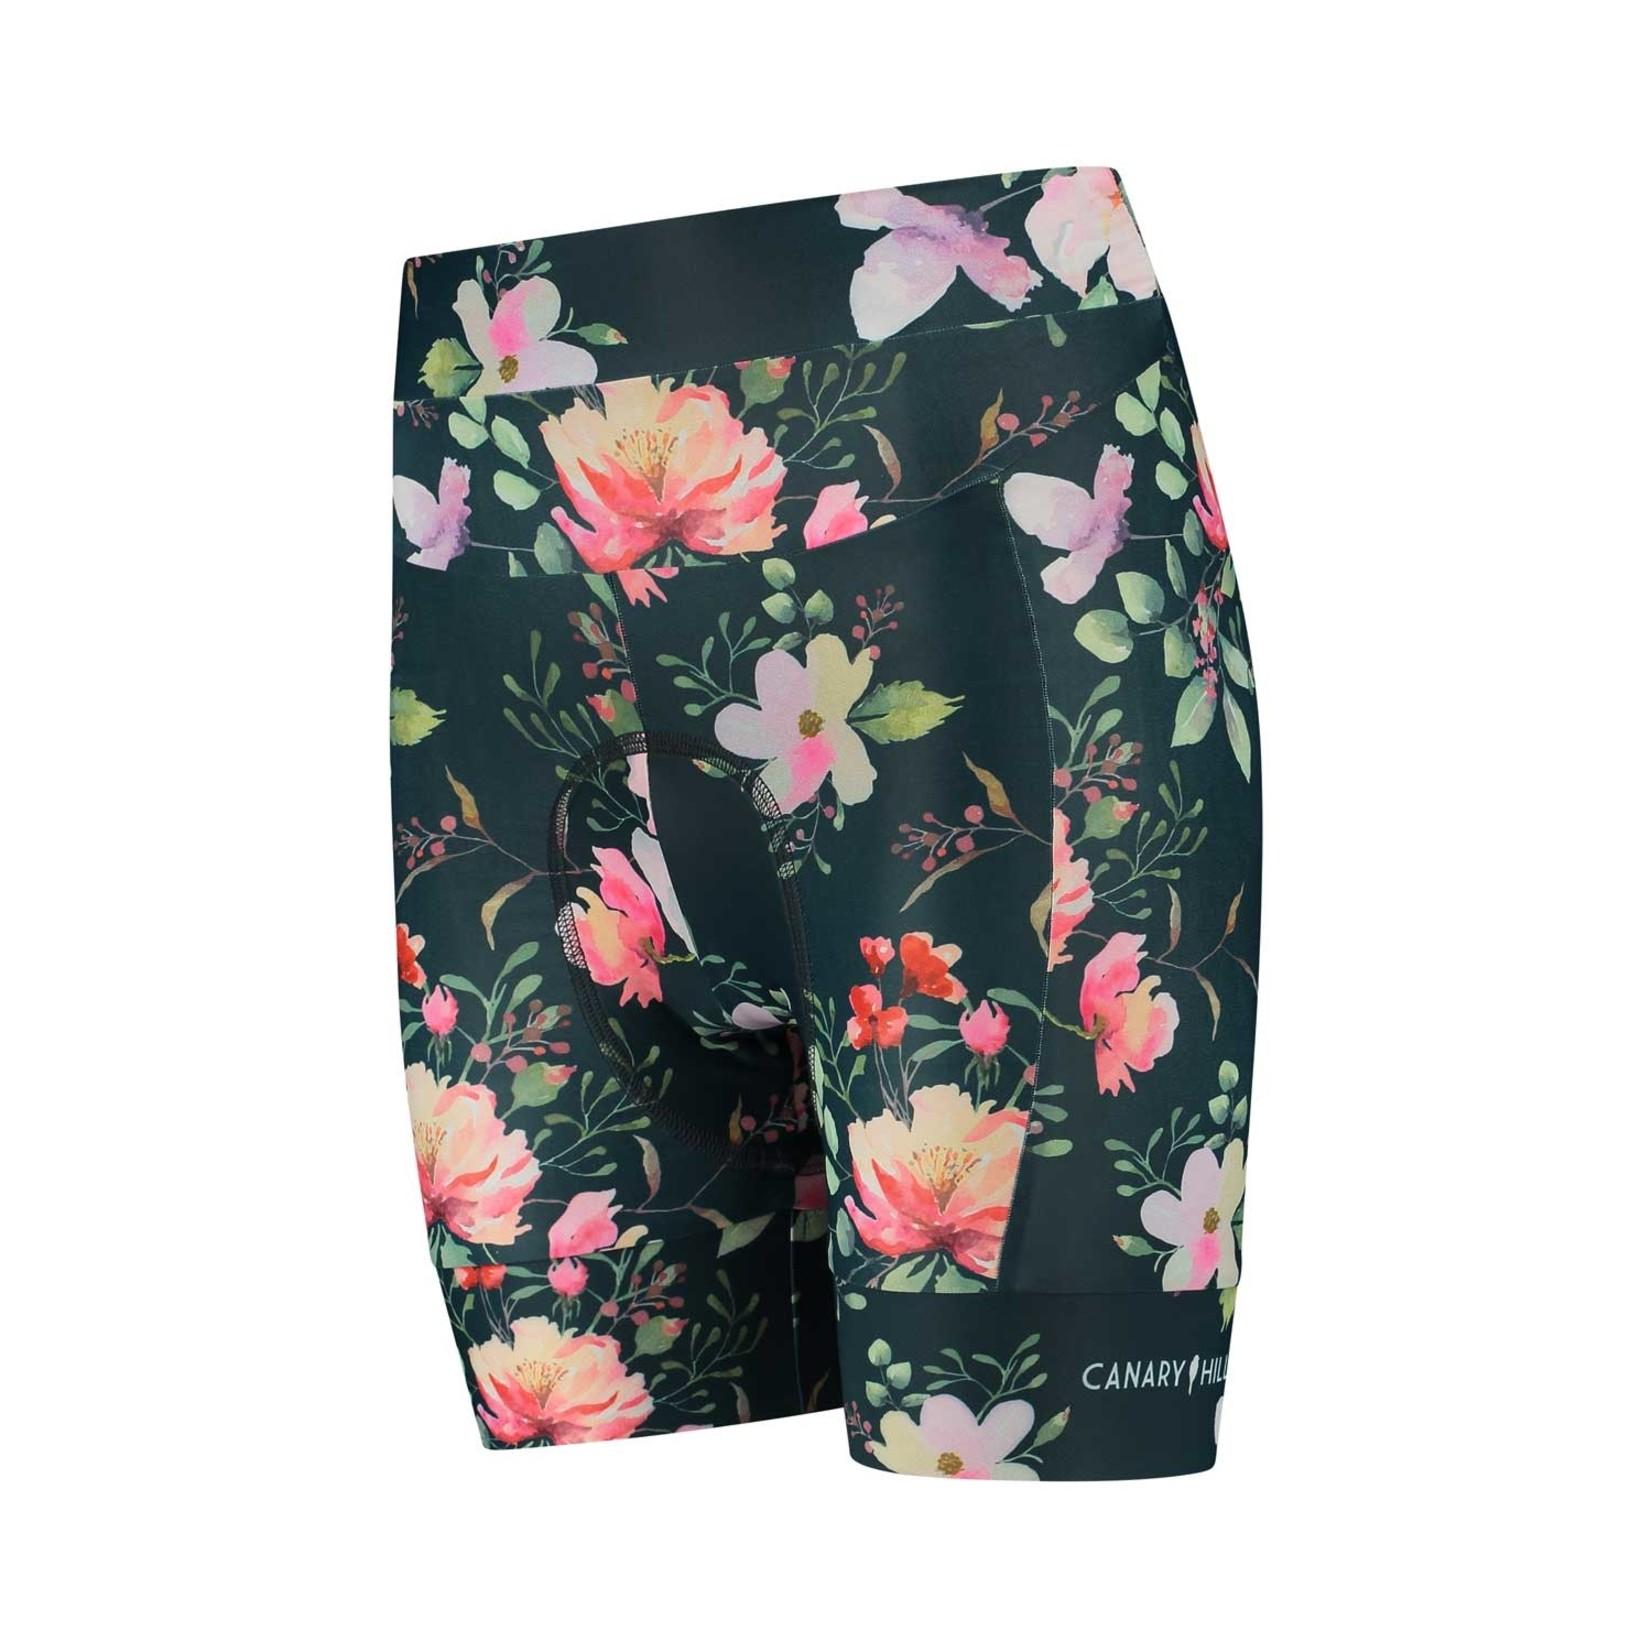 Canary Hill 'Bouquet' Bib shorts